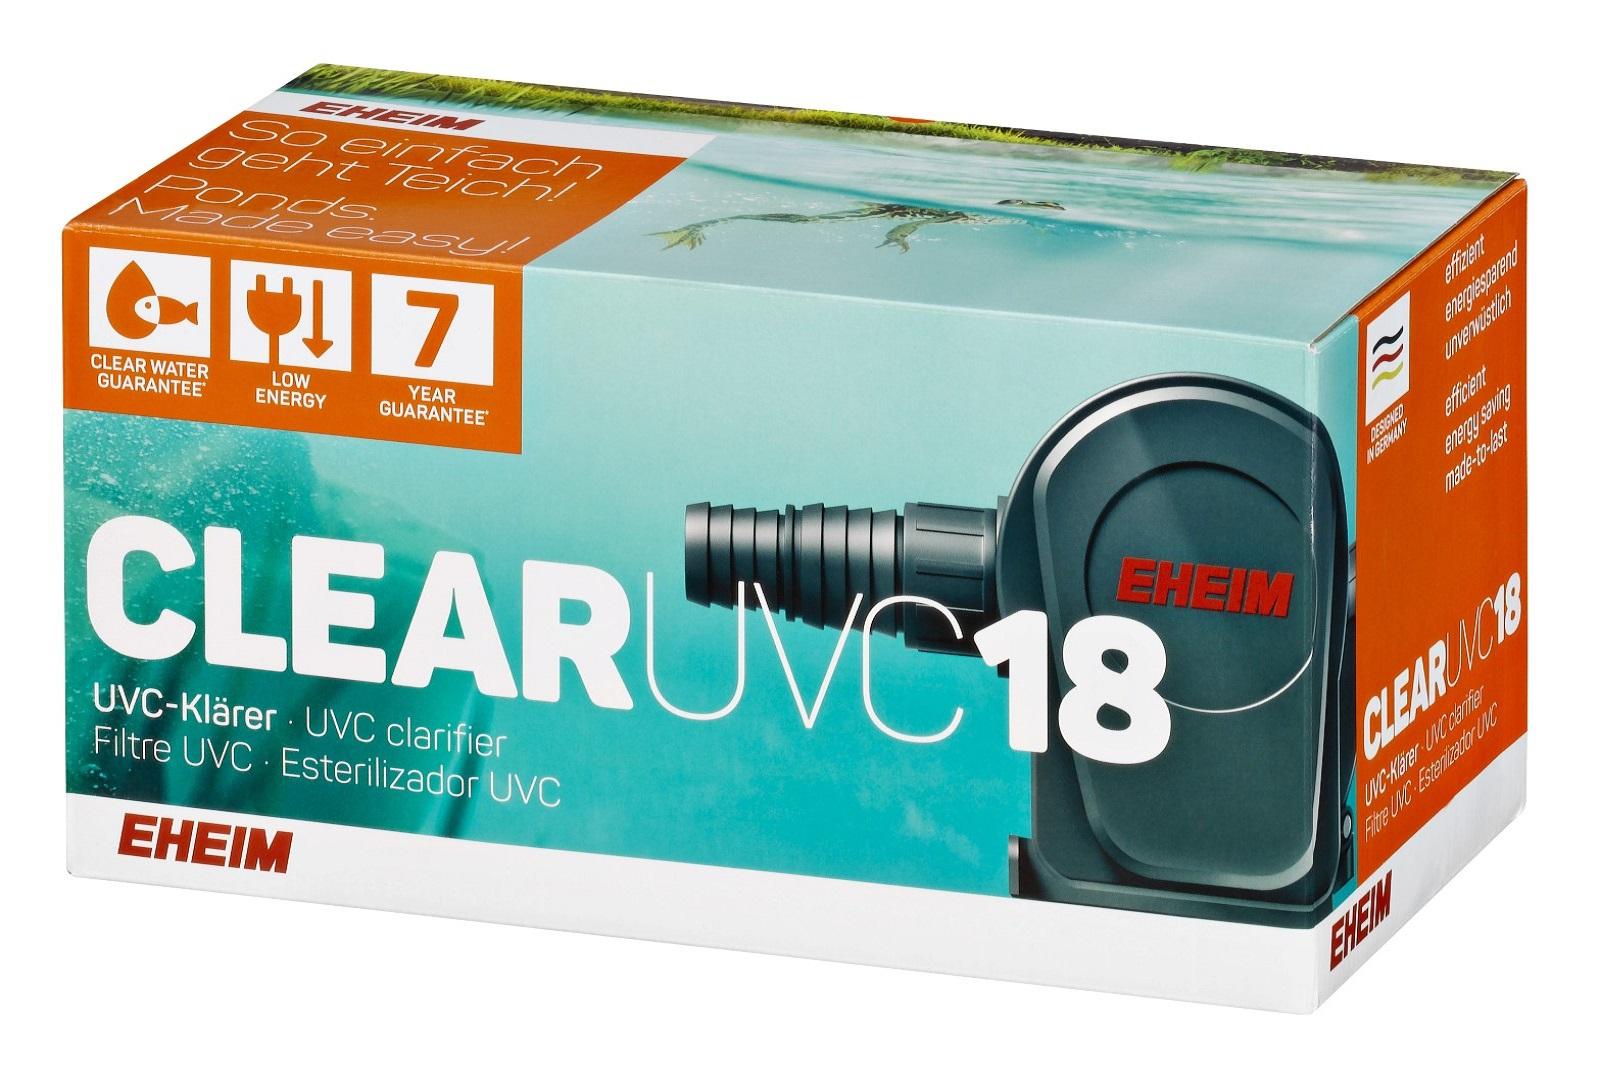 Eheim Clear UVC-18    UVC-Klärer